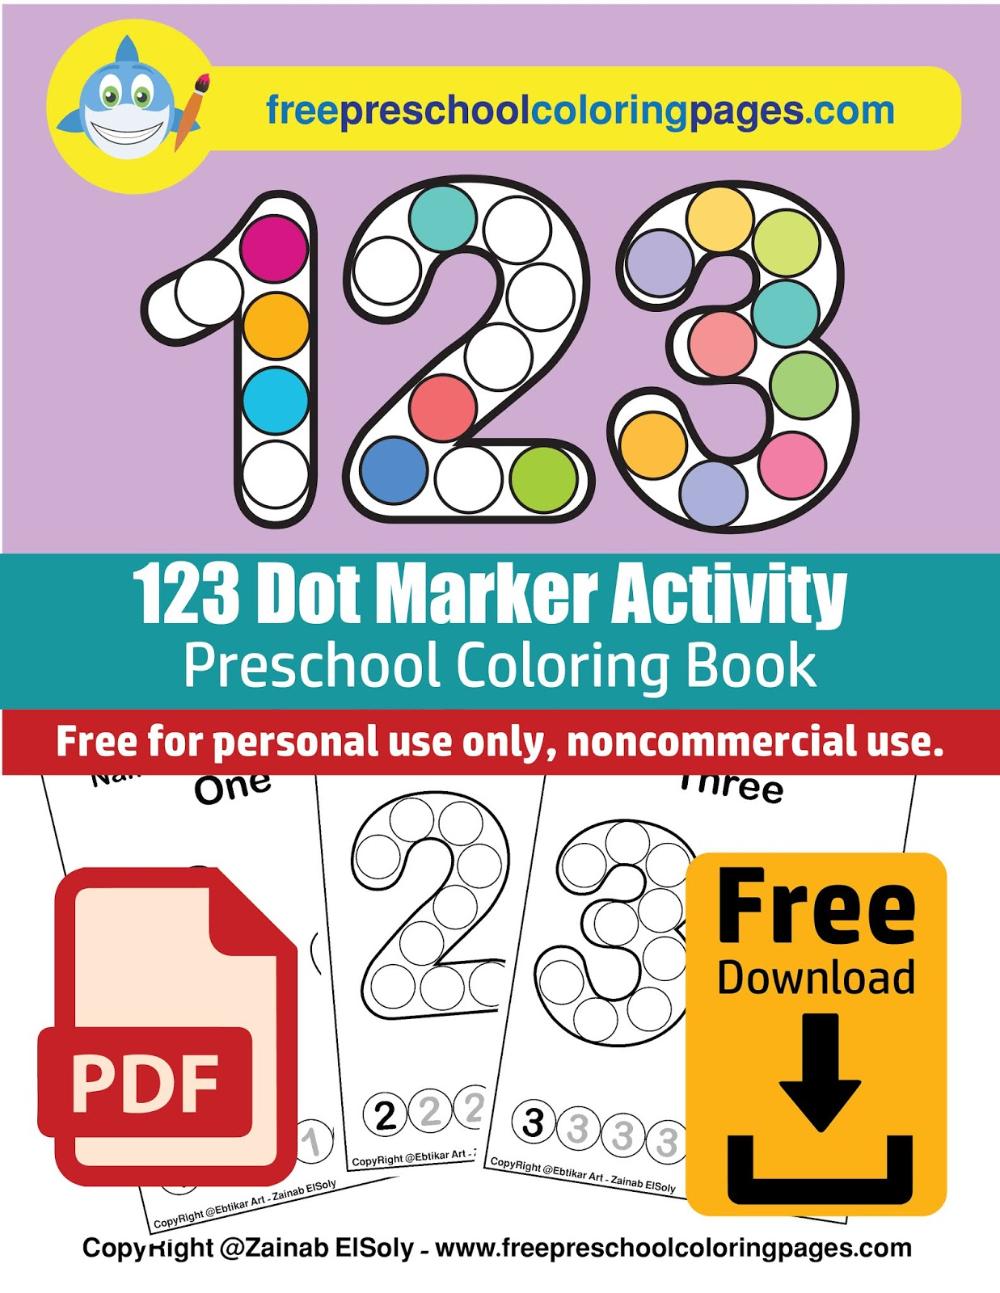 Numbers 123 Count Apples Dot Activity Free Preschool Coloring Sheets Numbers Preschool Printables Free Preschool Dot Marker Activities [ 1293 x 1000 Pixel ]